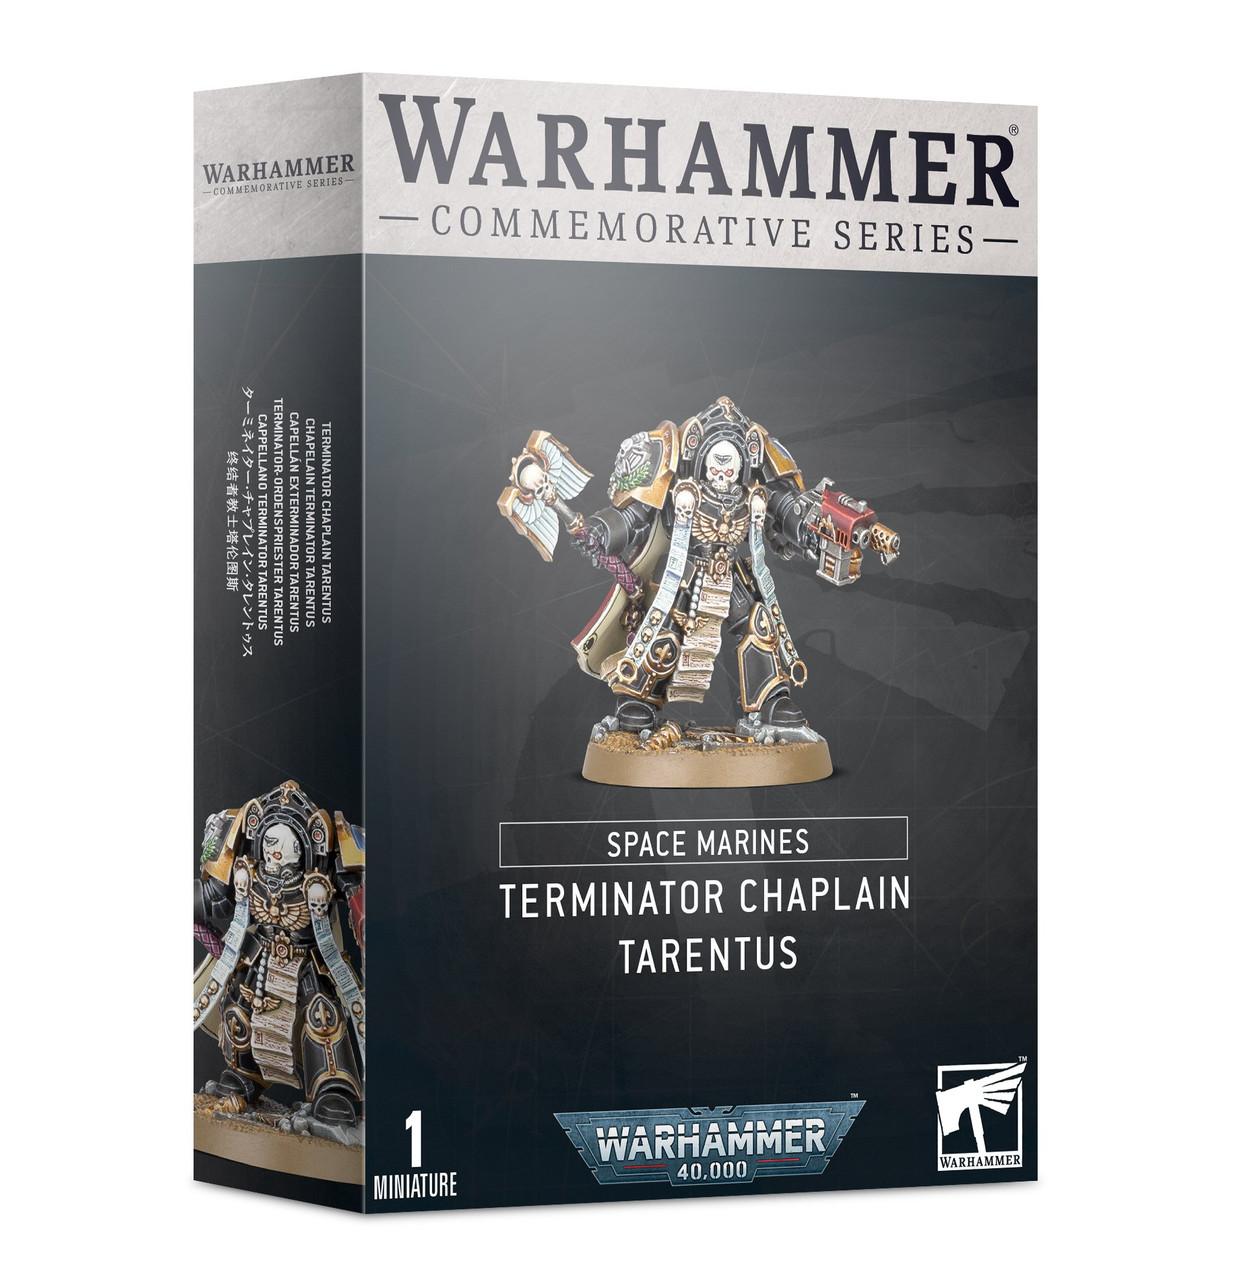 Warhammer Commemorative Series: Chaplain Tarentus